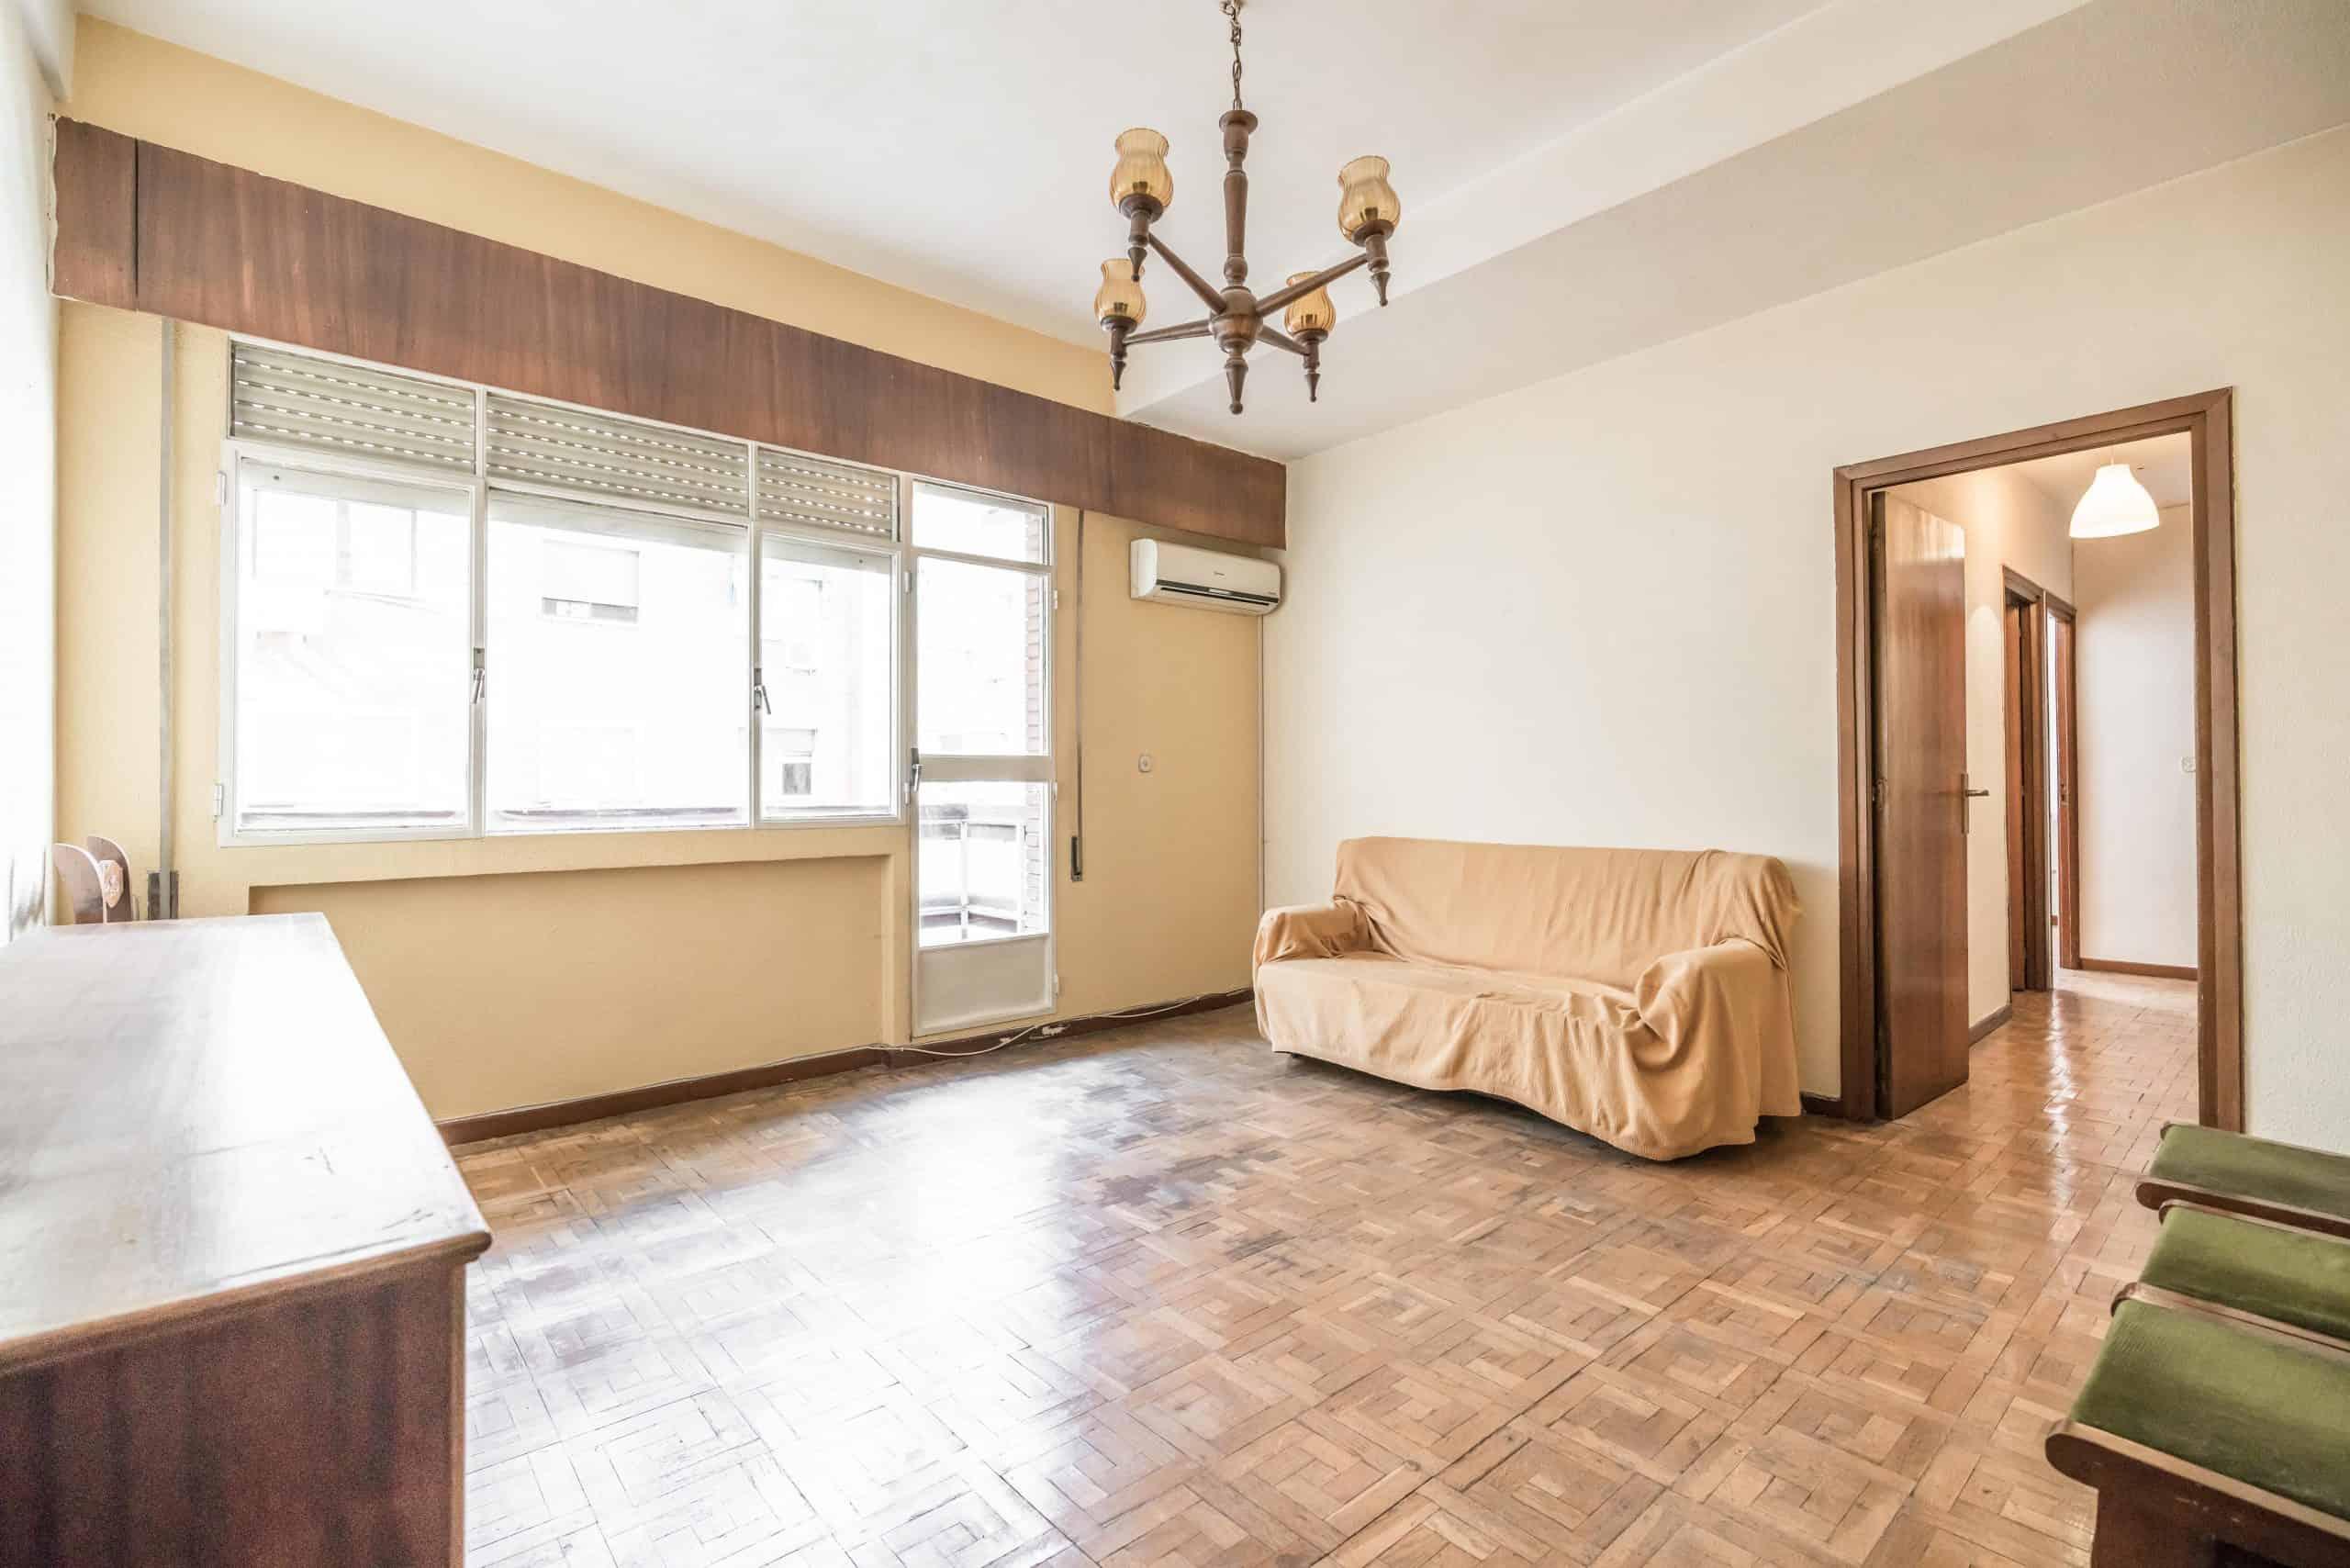 Agencia Inmobiliaria de Madrid-FUTUROCASA-Zona ARGANZUELA-EMBAJADORES-LEGAZPI -calle EMBAJADORES 108-SALON3